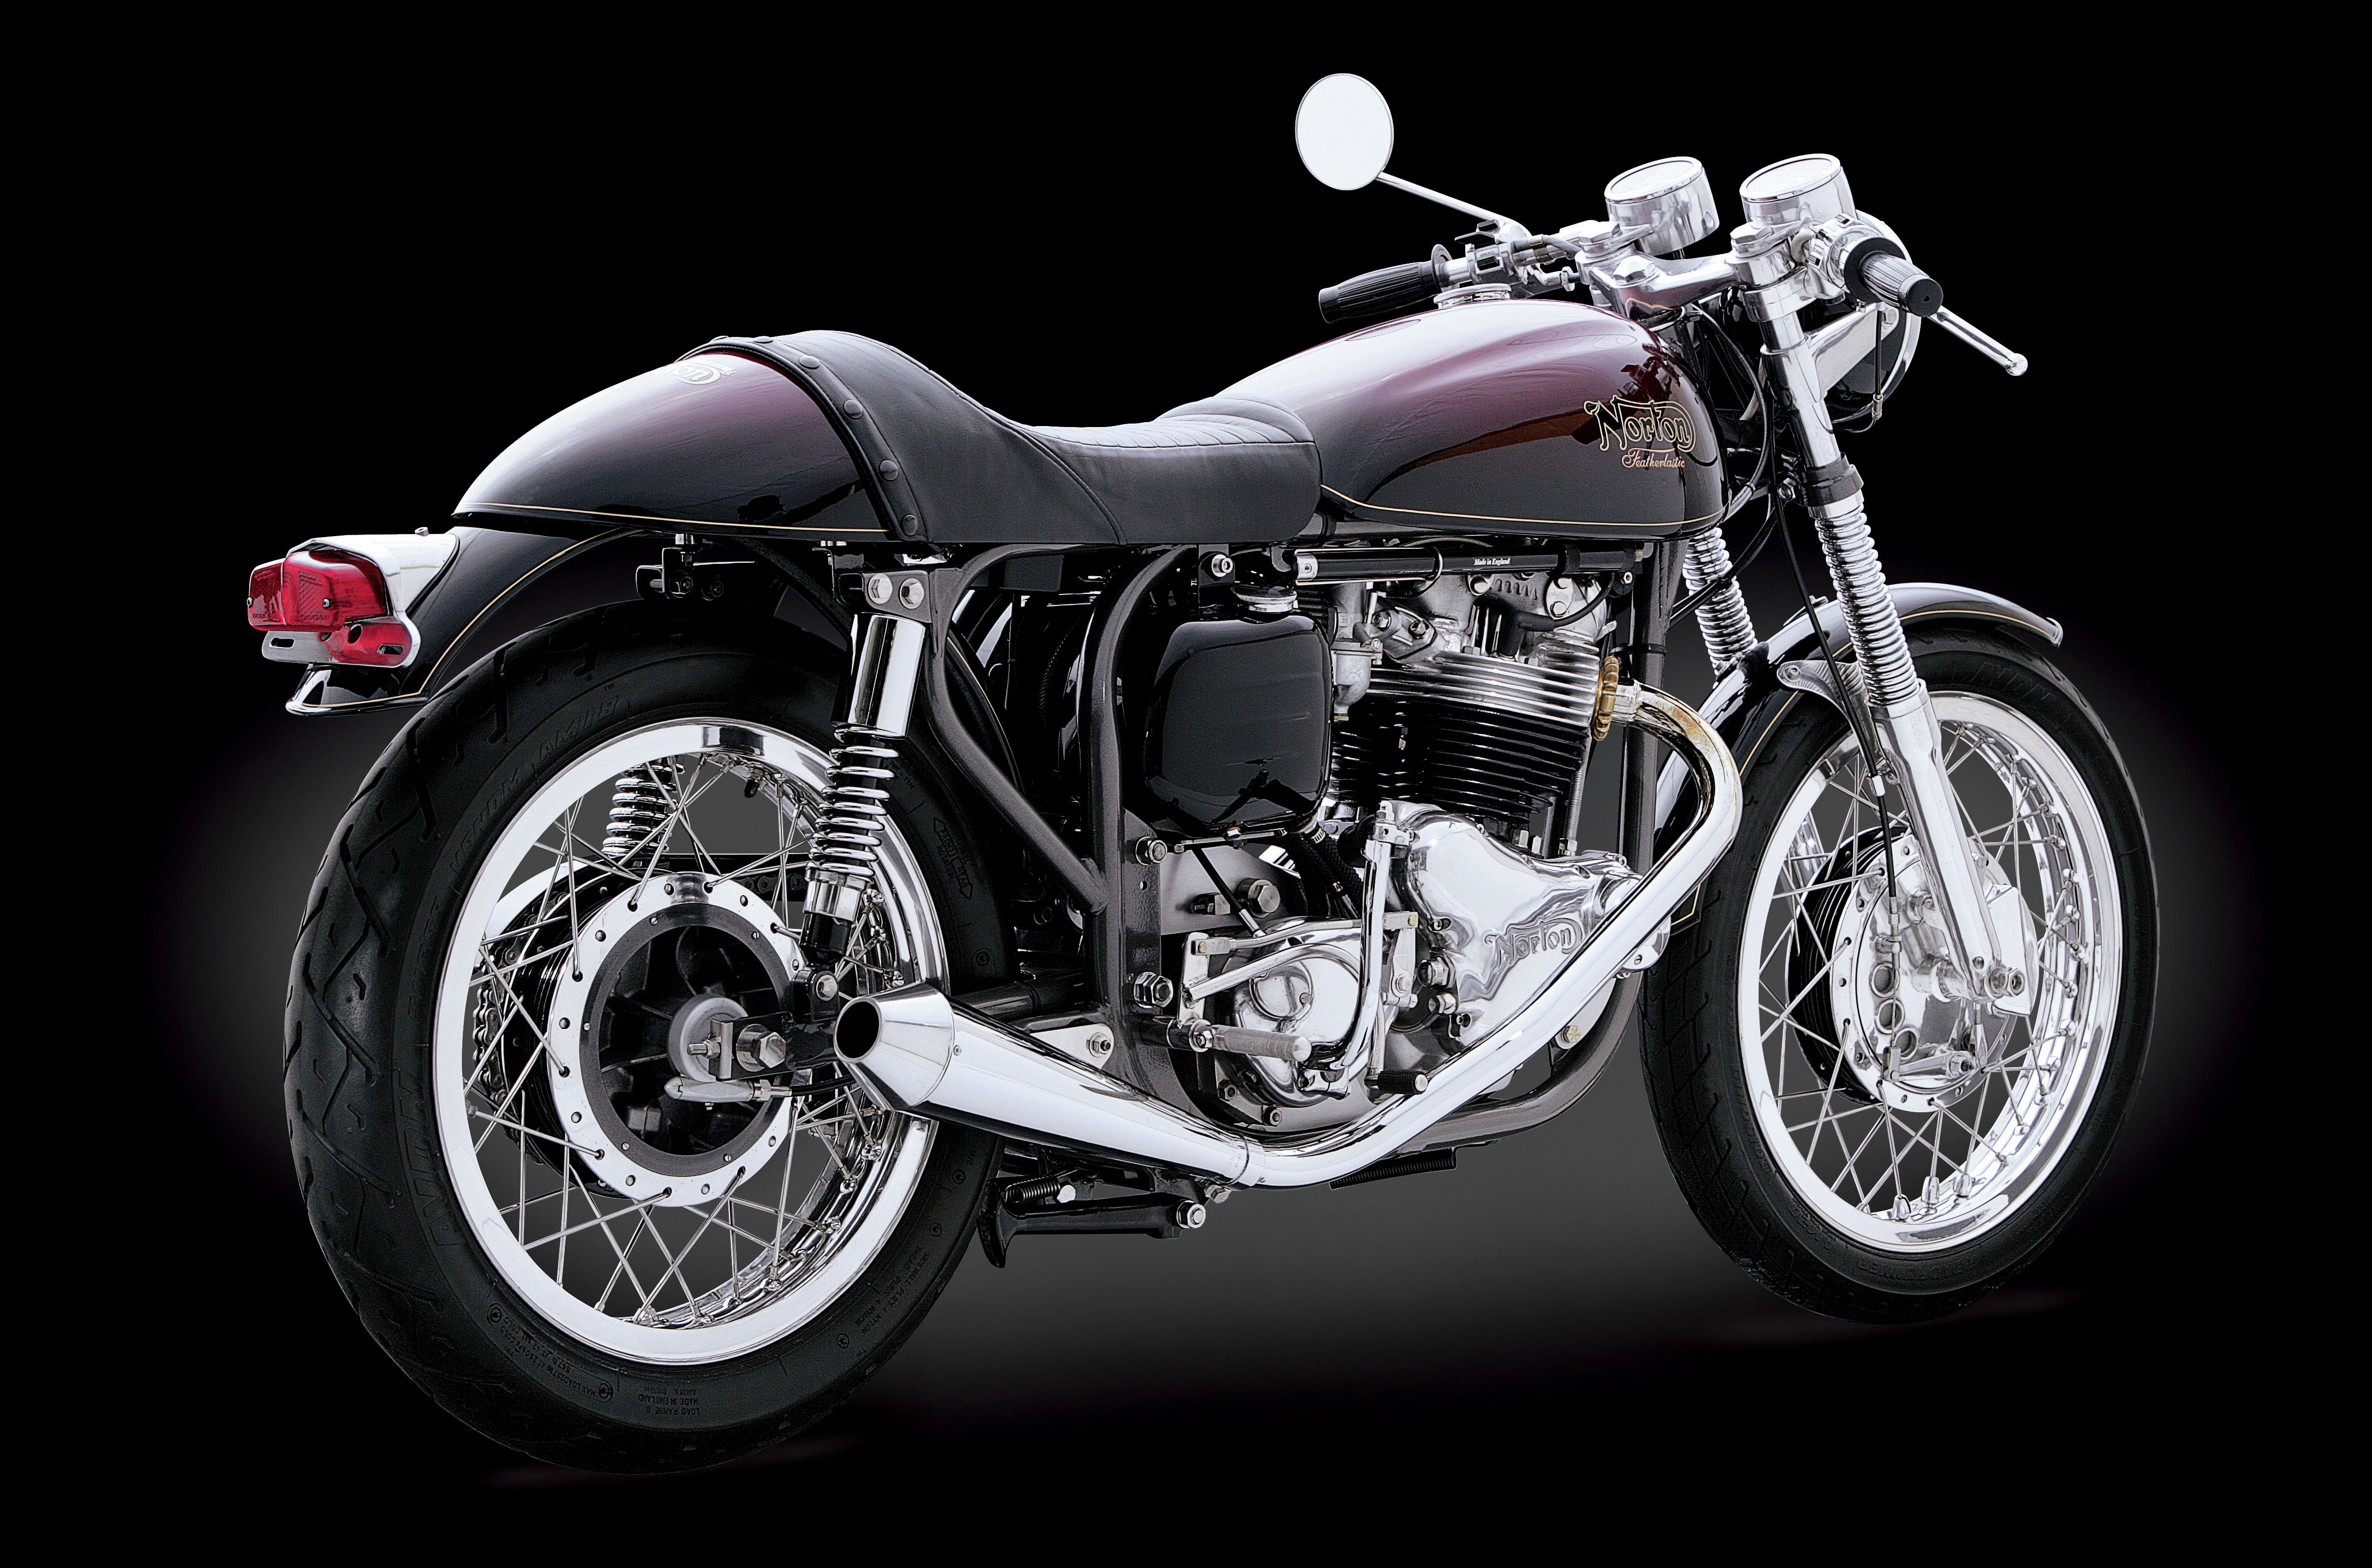 Suzuki B-King Naked Bike Motorcycle Review   Cycle World